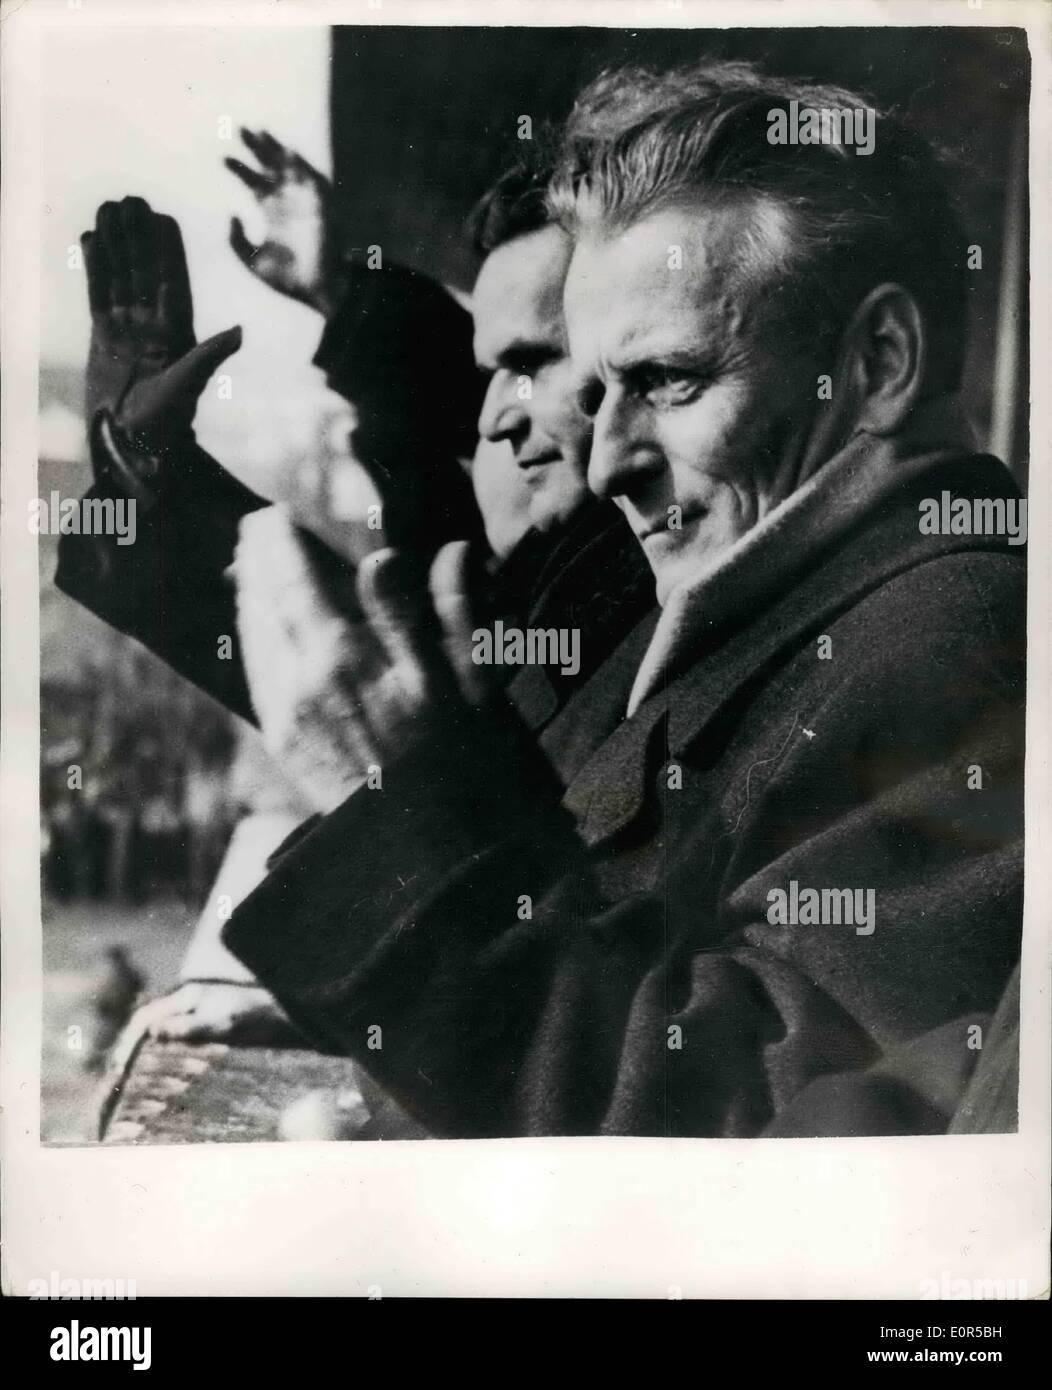 Feb. 28, 1958 - 28-2-58 Grand People's Militia Parade in Prague – A grand People's Militia parade was held - Stock Image